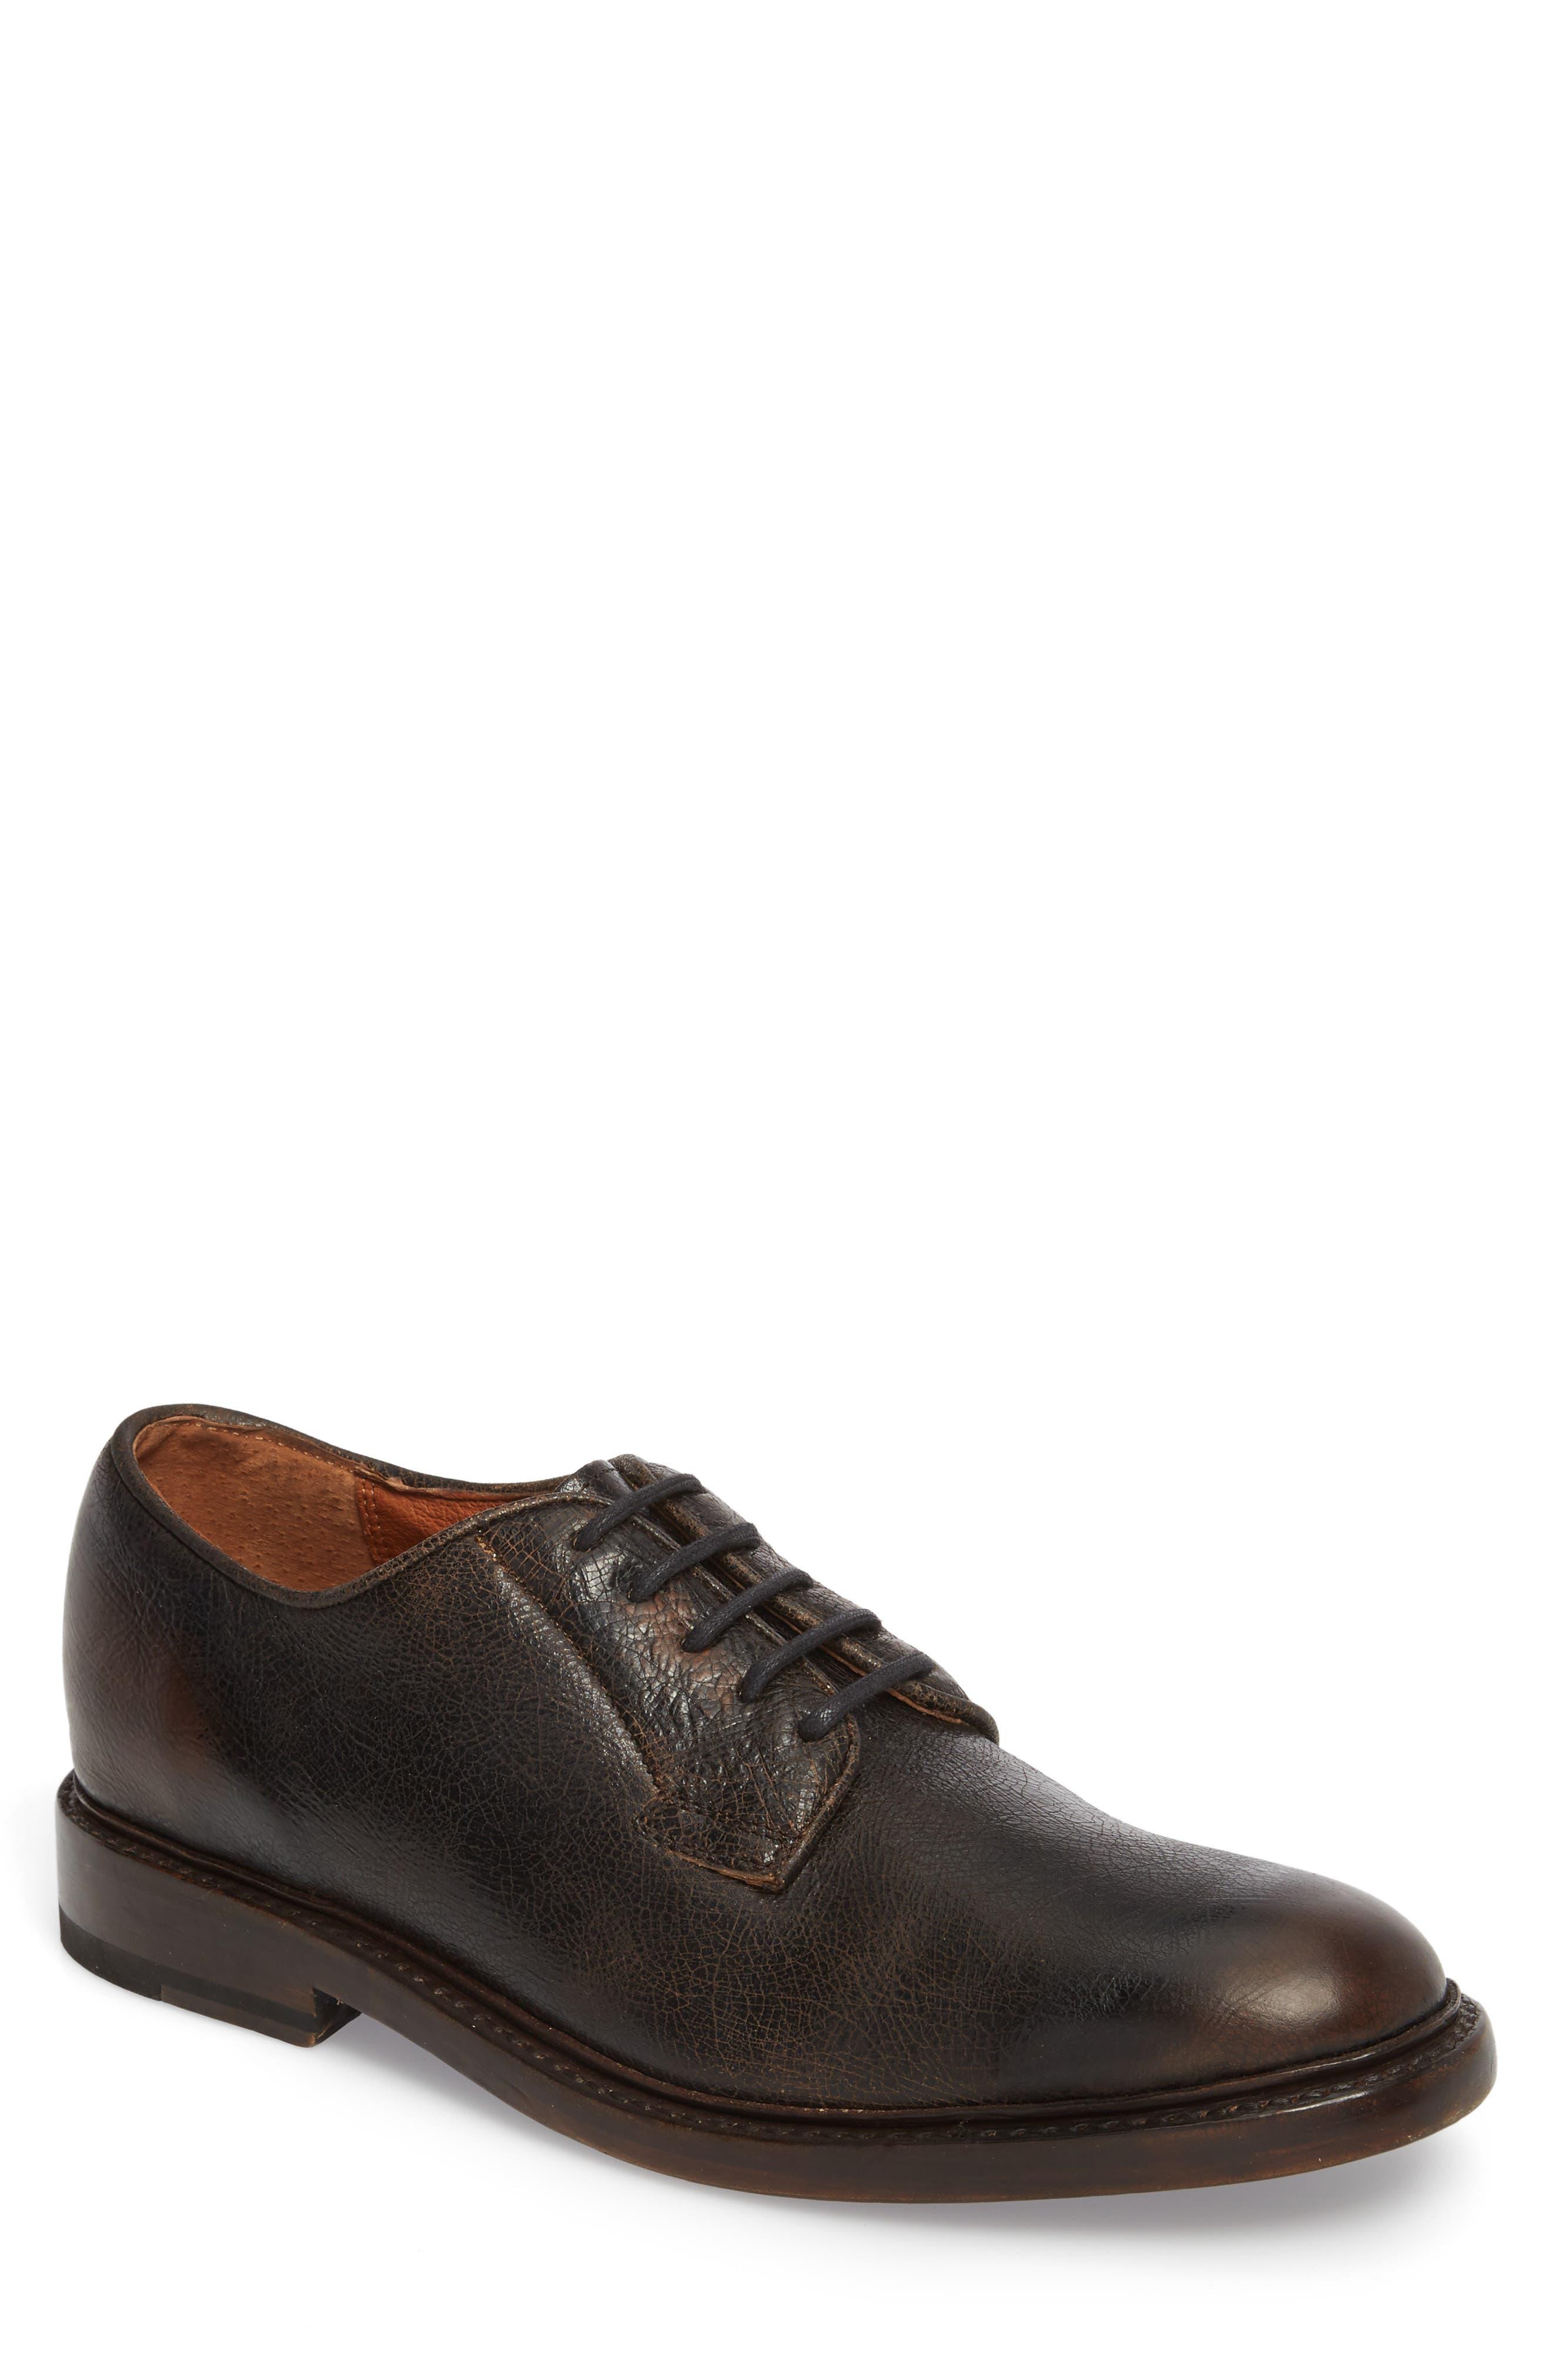 Jones Plain Toe Derby,                             Main thumbnail 1, color,                             Dark Brown Leather